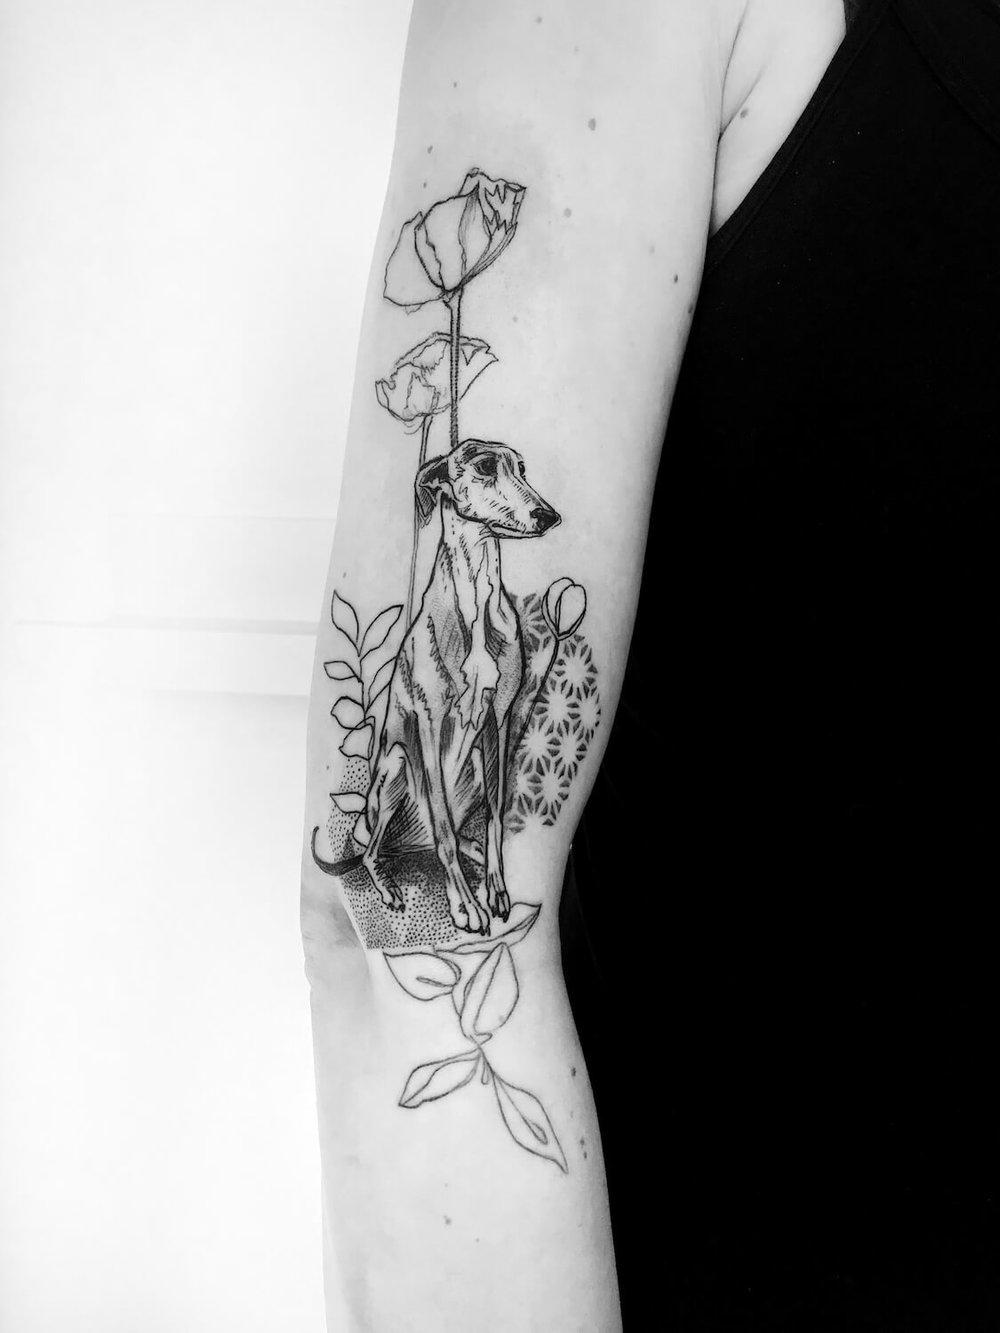 whippet-sketchy-studio-velbert-langenberg-madlyne-van-looy-tattoo-art.jpg